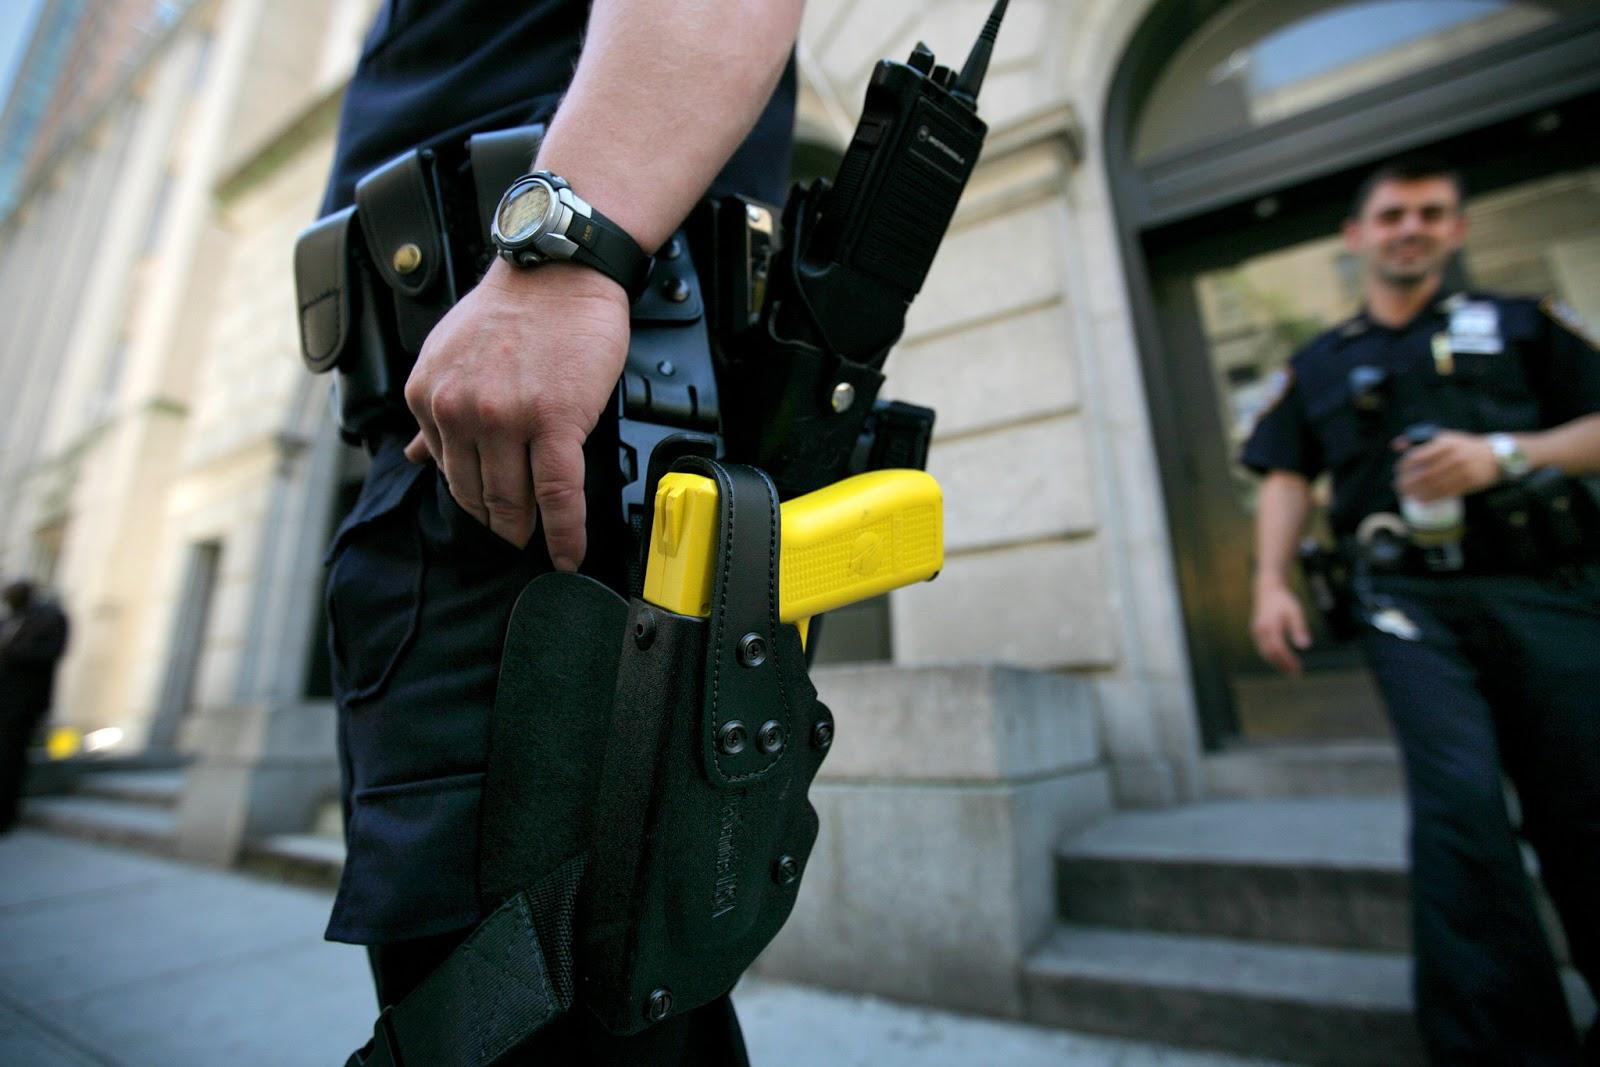 Національна поліція тестує 200 електрошокерів Taser